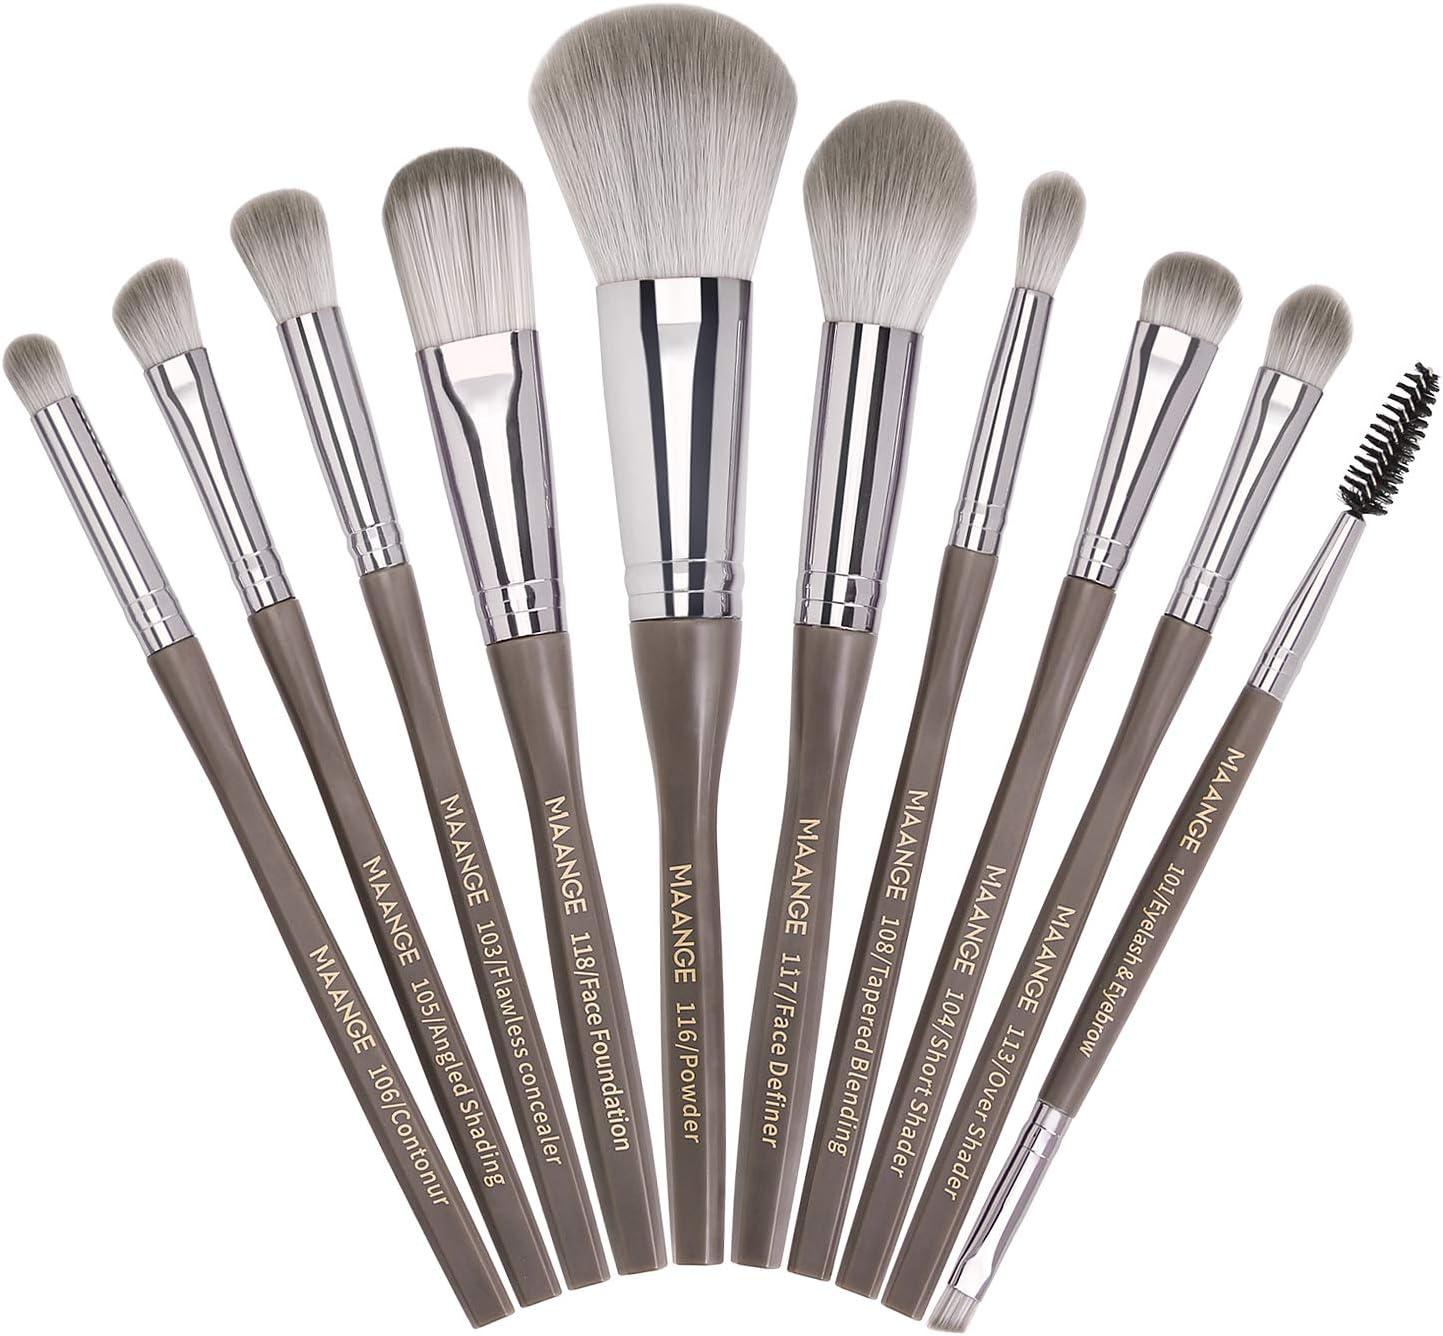 Pinceles de maquillaje 10 piezas Juego de pinceles de maquillaje Premium Synthetic Foundation Brush Blending Face Powder Blush Correctores Sombras de ojos Kit de pinceles de maquillaje